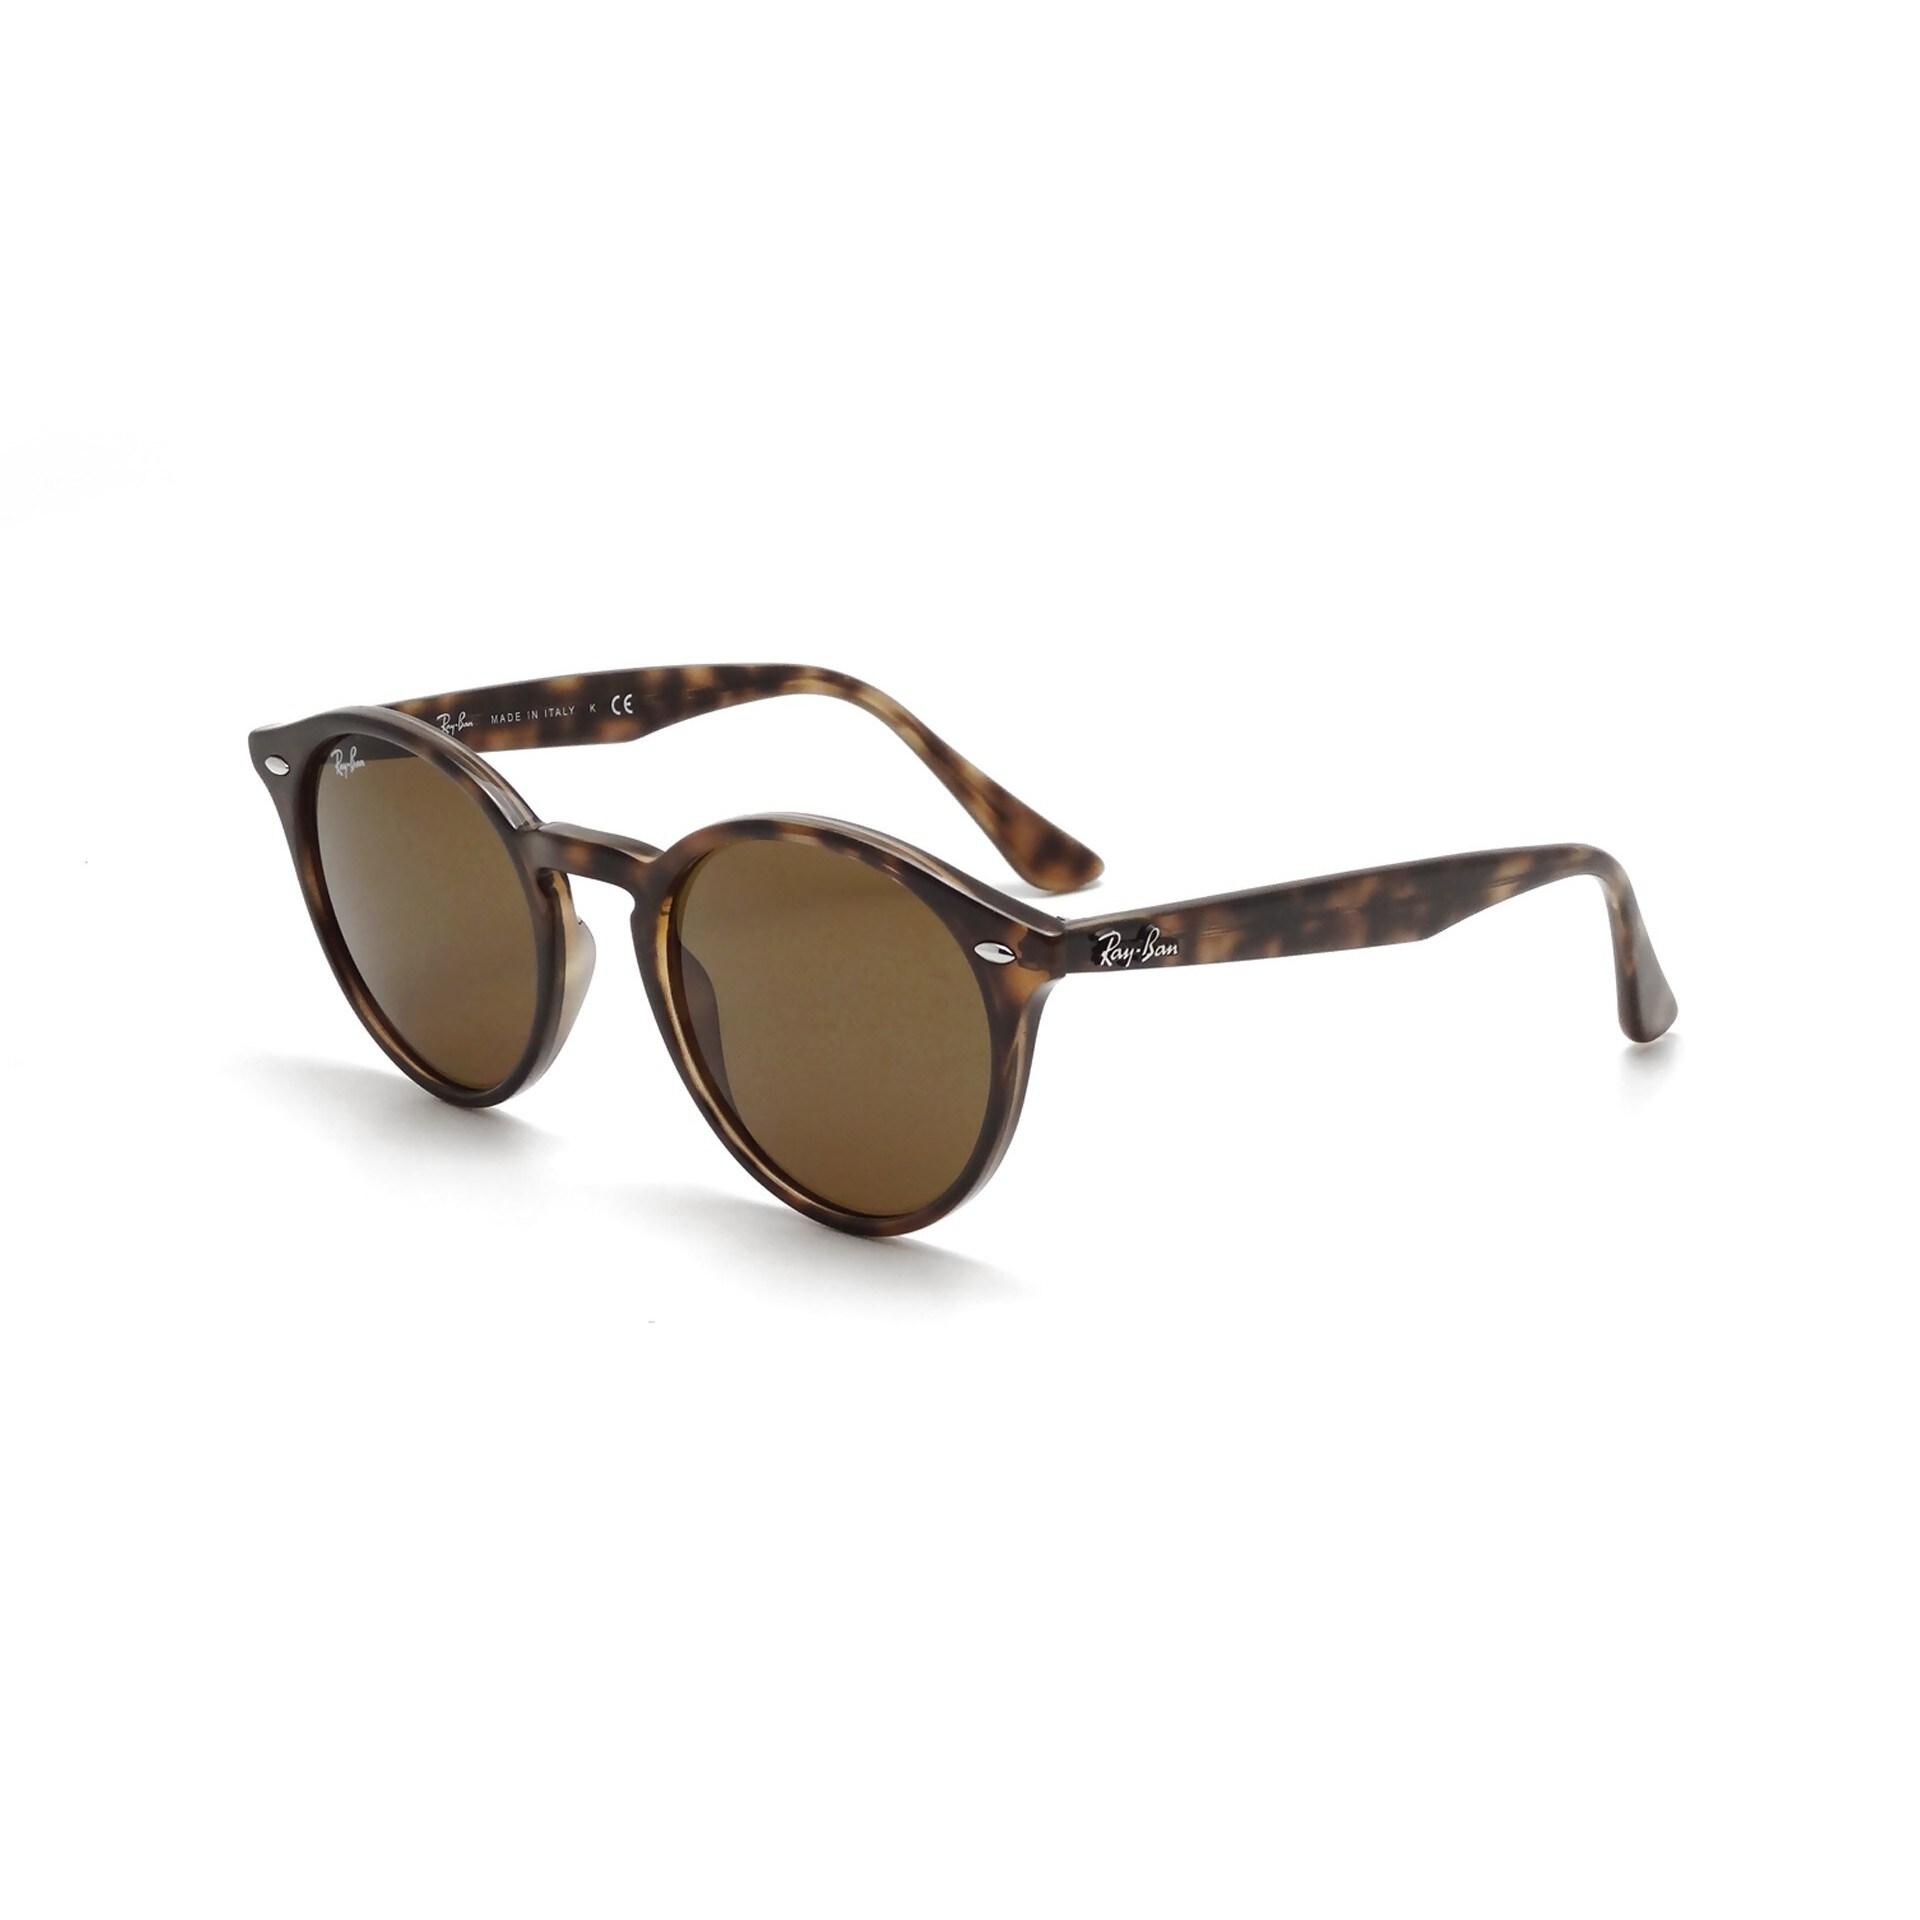 7154d0bc28d36 Tortoise Women s Sunglasses